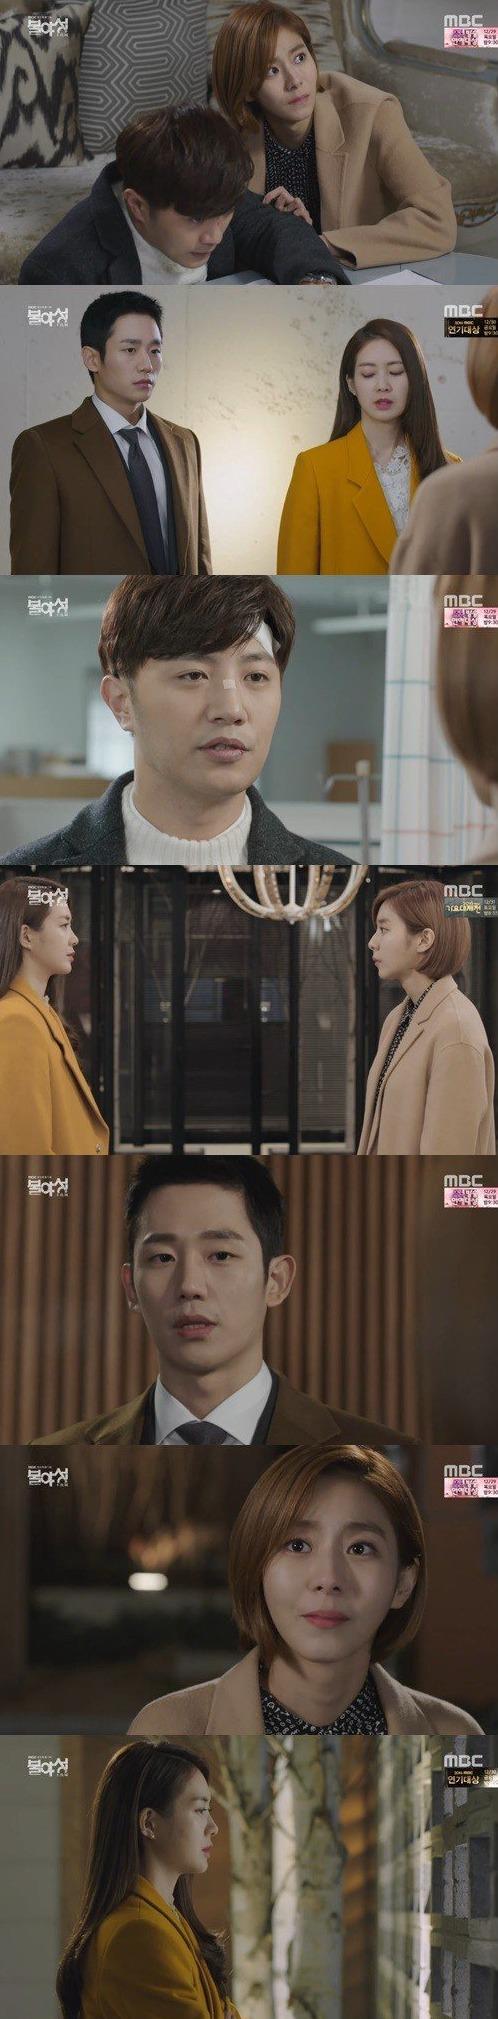 Night light korean drama synopsis -  Spoiler Added Episode 12 Captures For The Kdrama Night Light